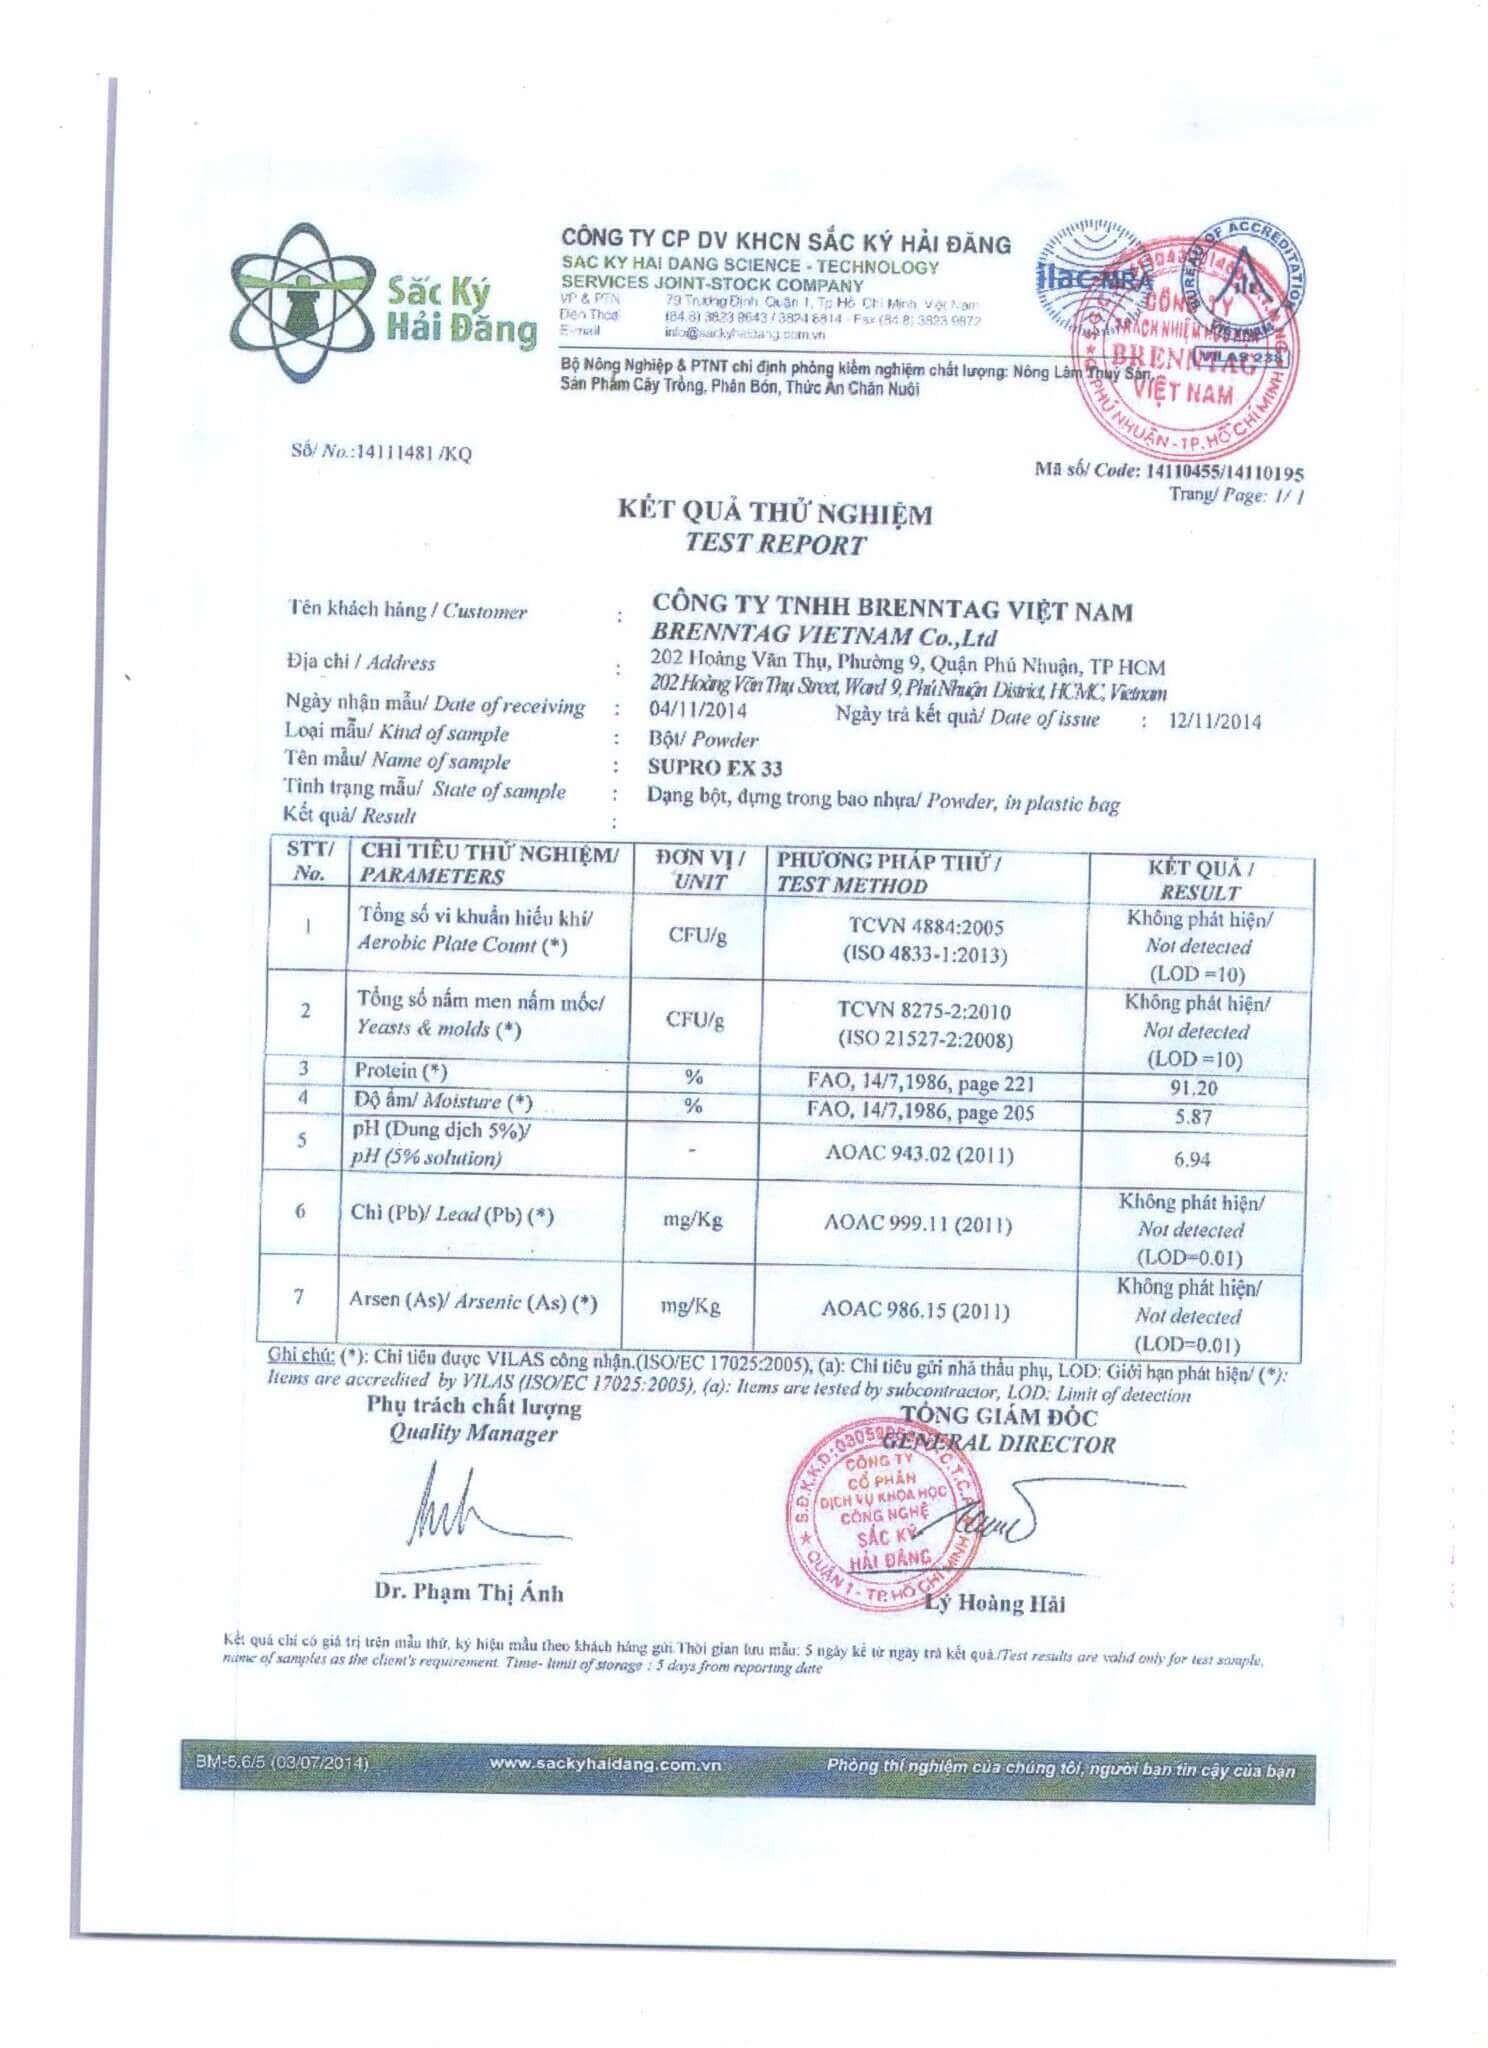 burdock_seasoning_-_tam_minh_food_company_limited_test_report